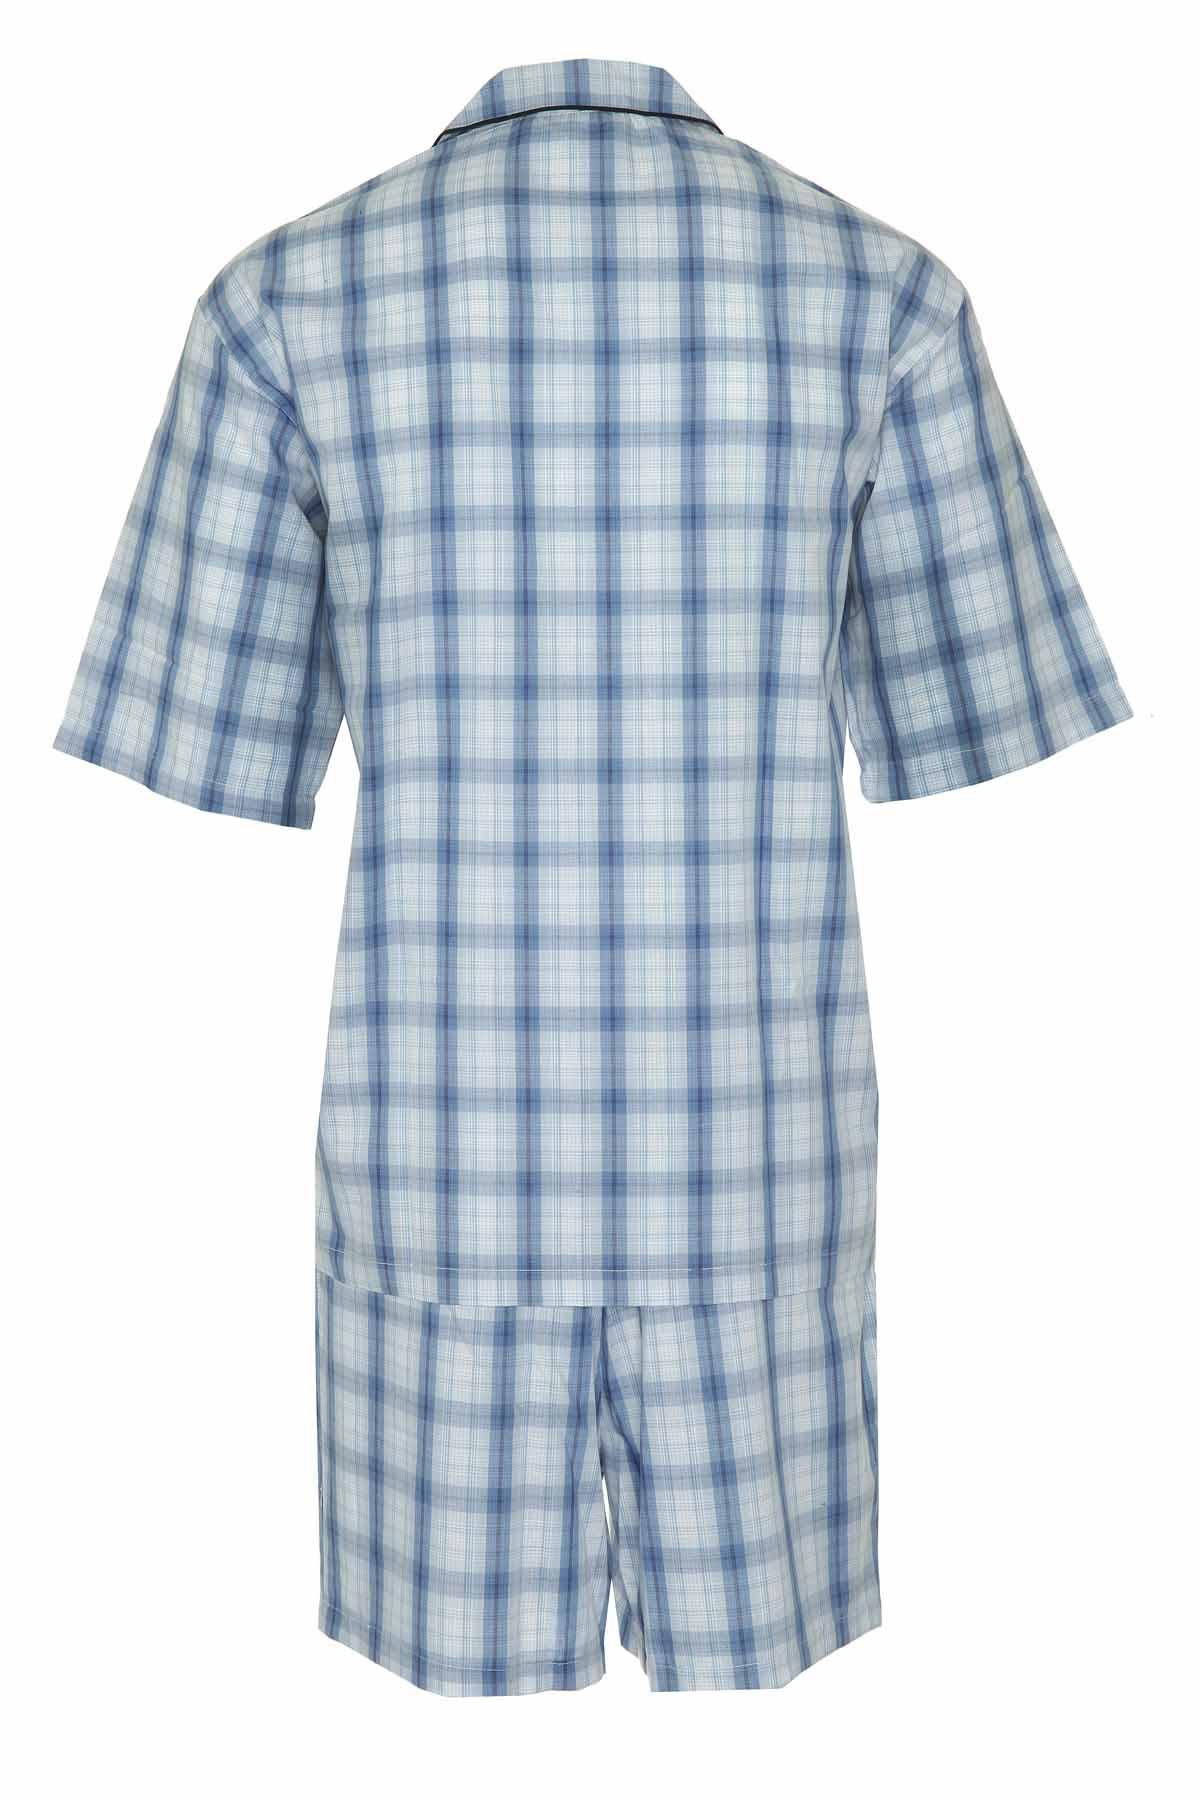 Champion Mens Polycotton Short Pyjama Lounge Wear Set